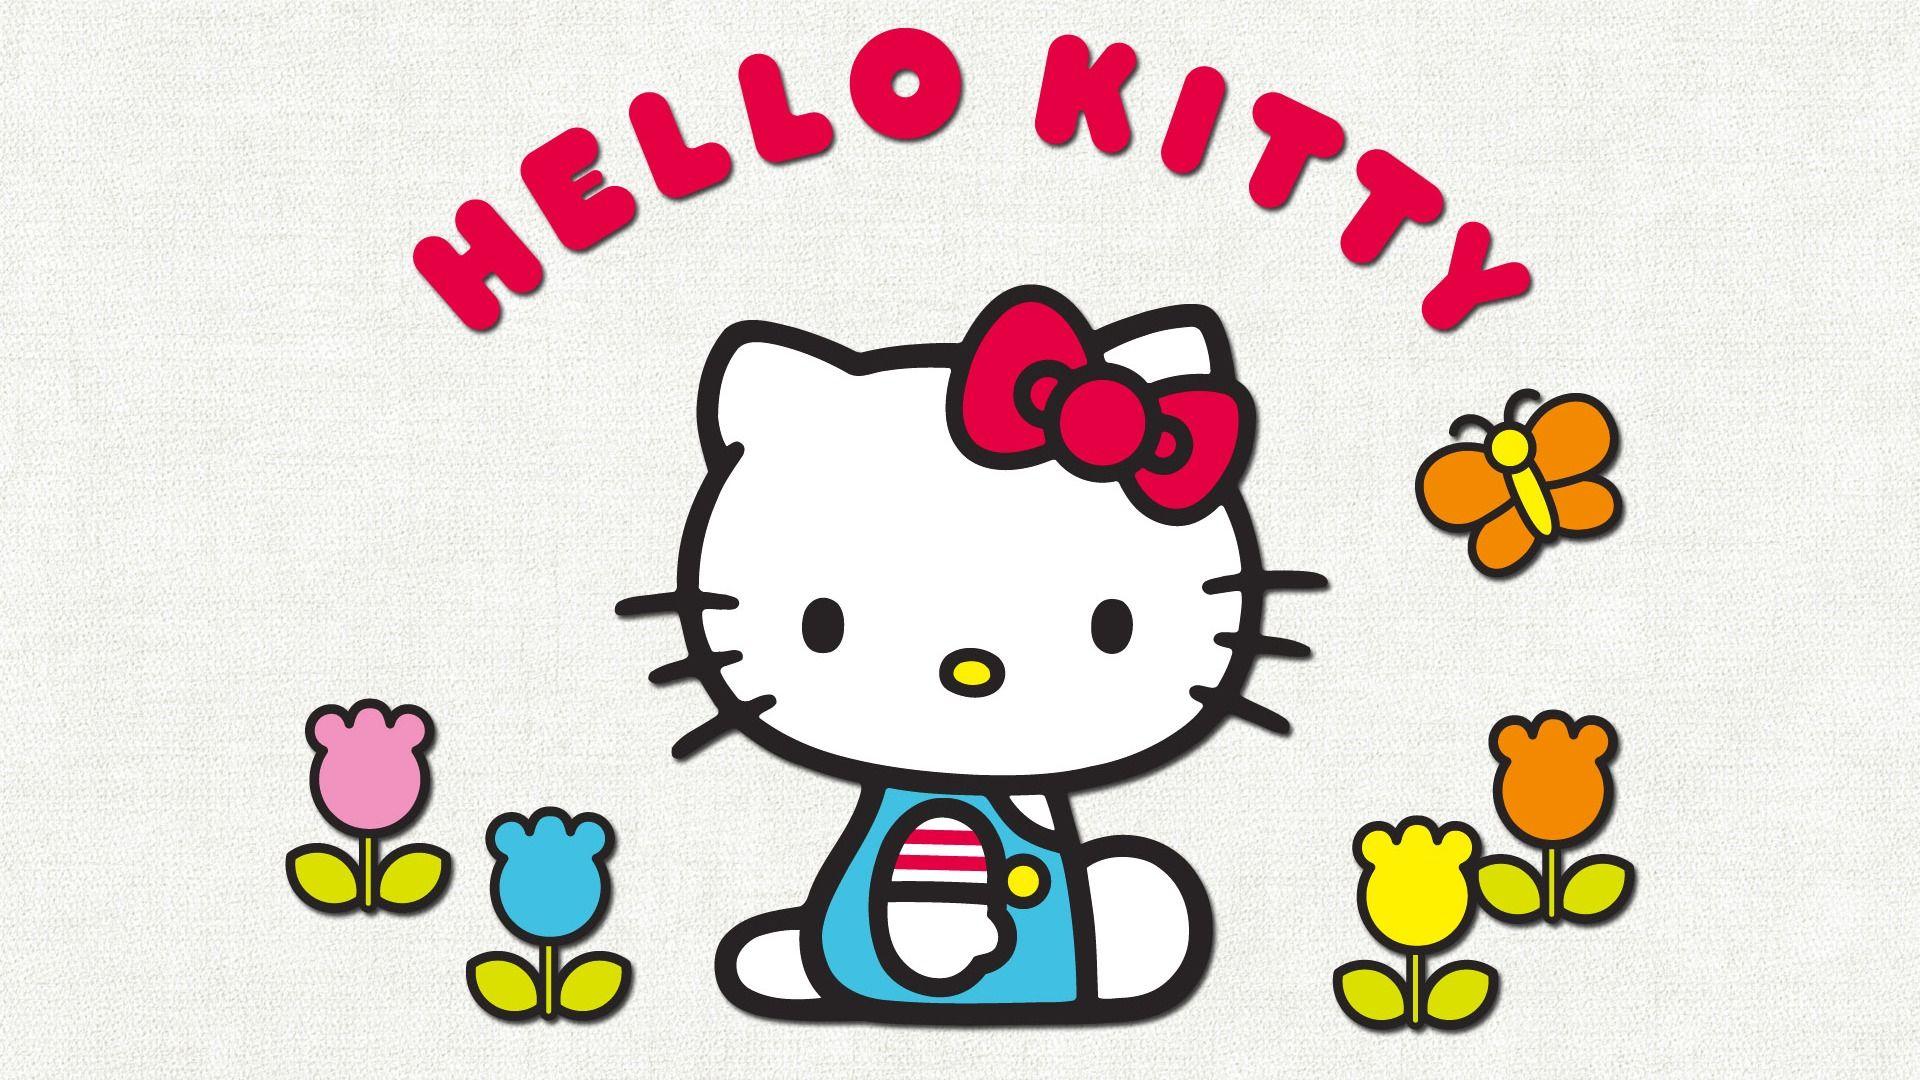 Cute Hello Kitty Desktop Wallpaper Tulips Cute Wallpapers Hello Kitty Backgrounds Hello Kitty Images Hello Kitty